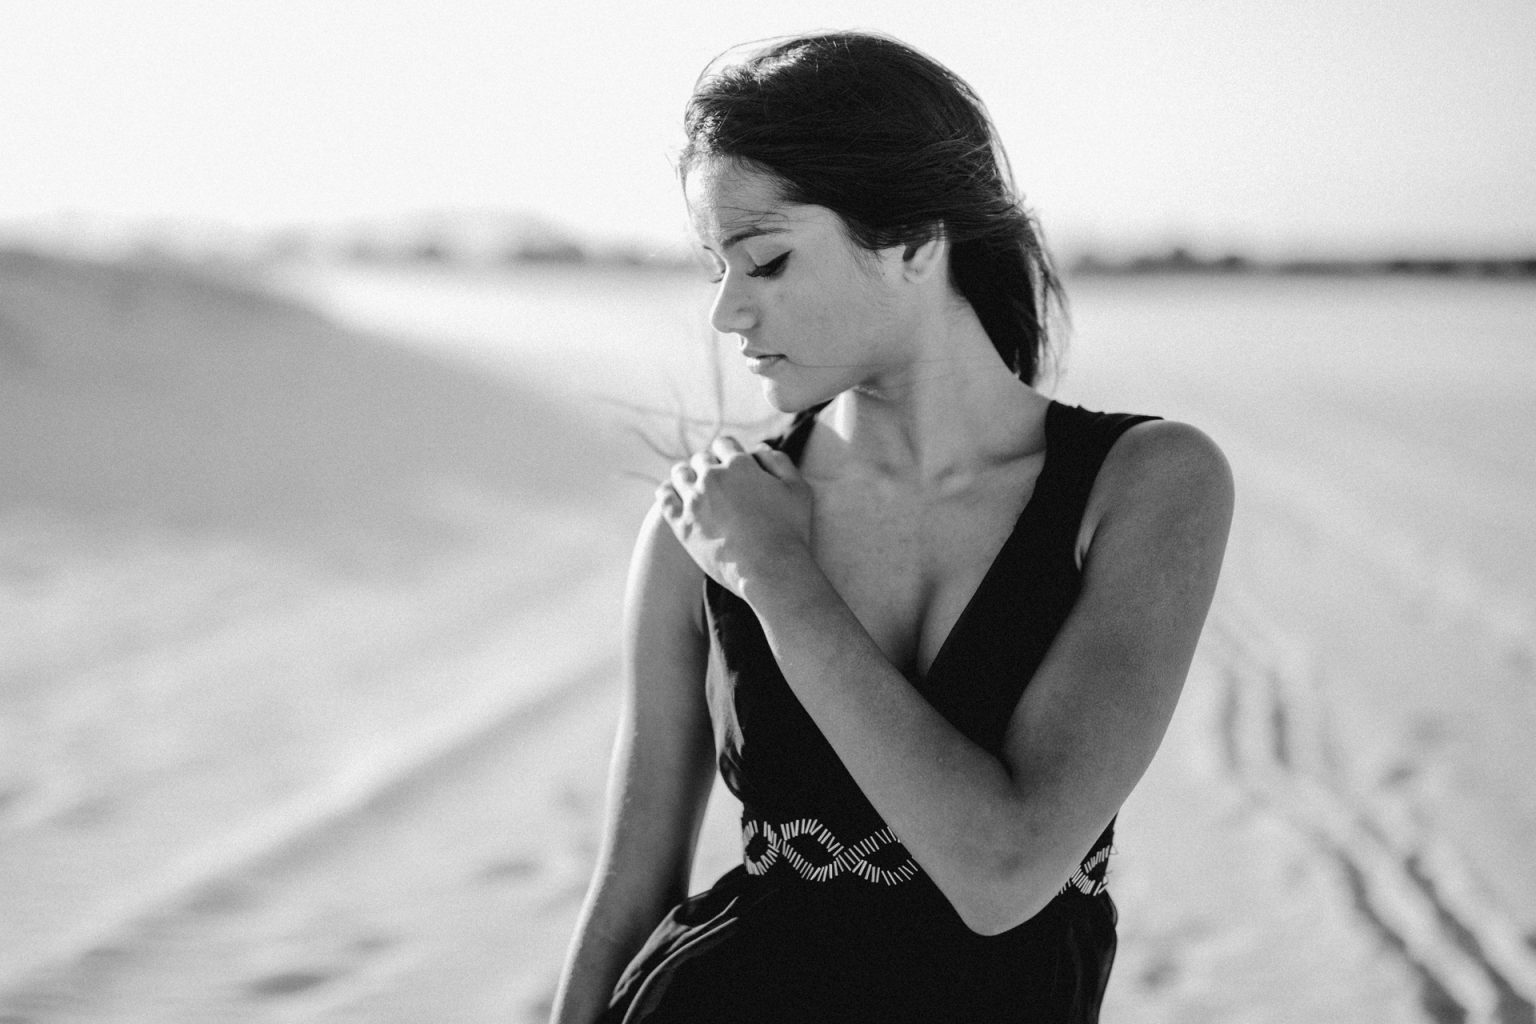 woman on beach windy hair brunette